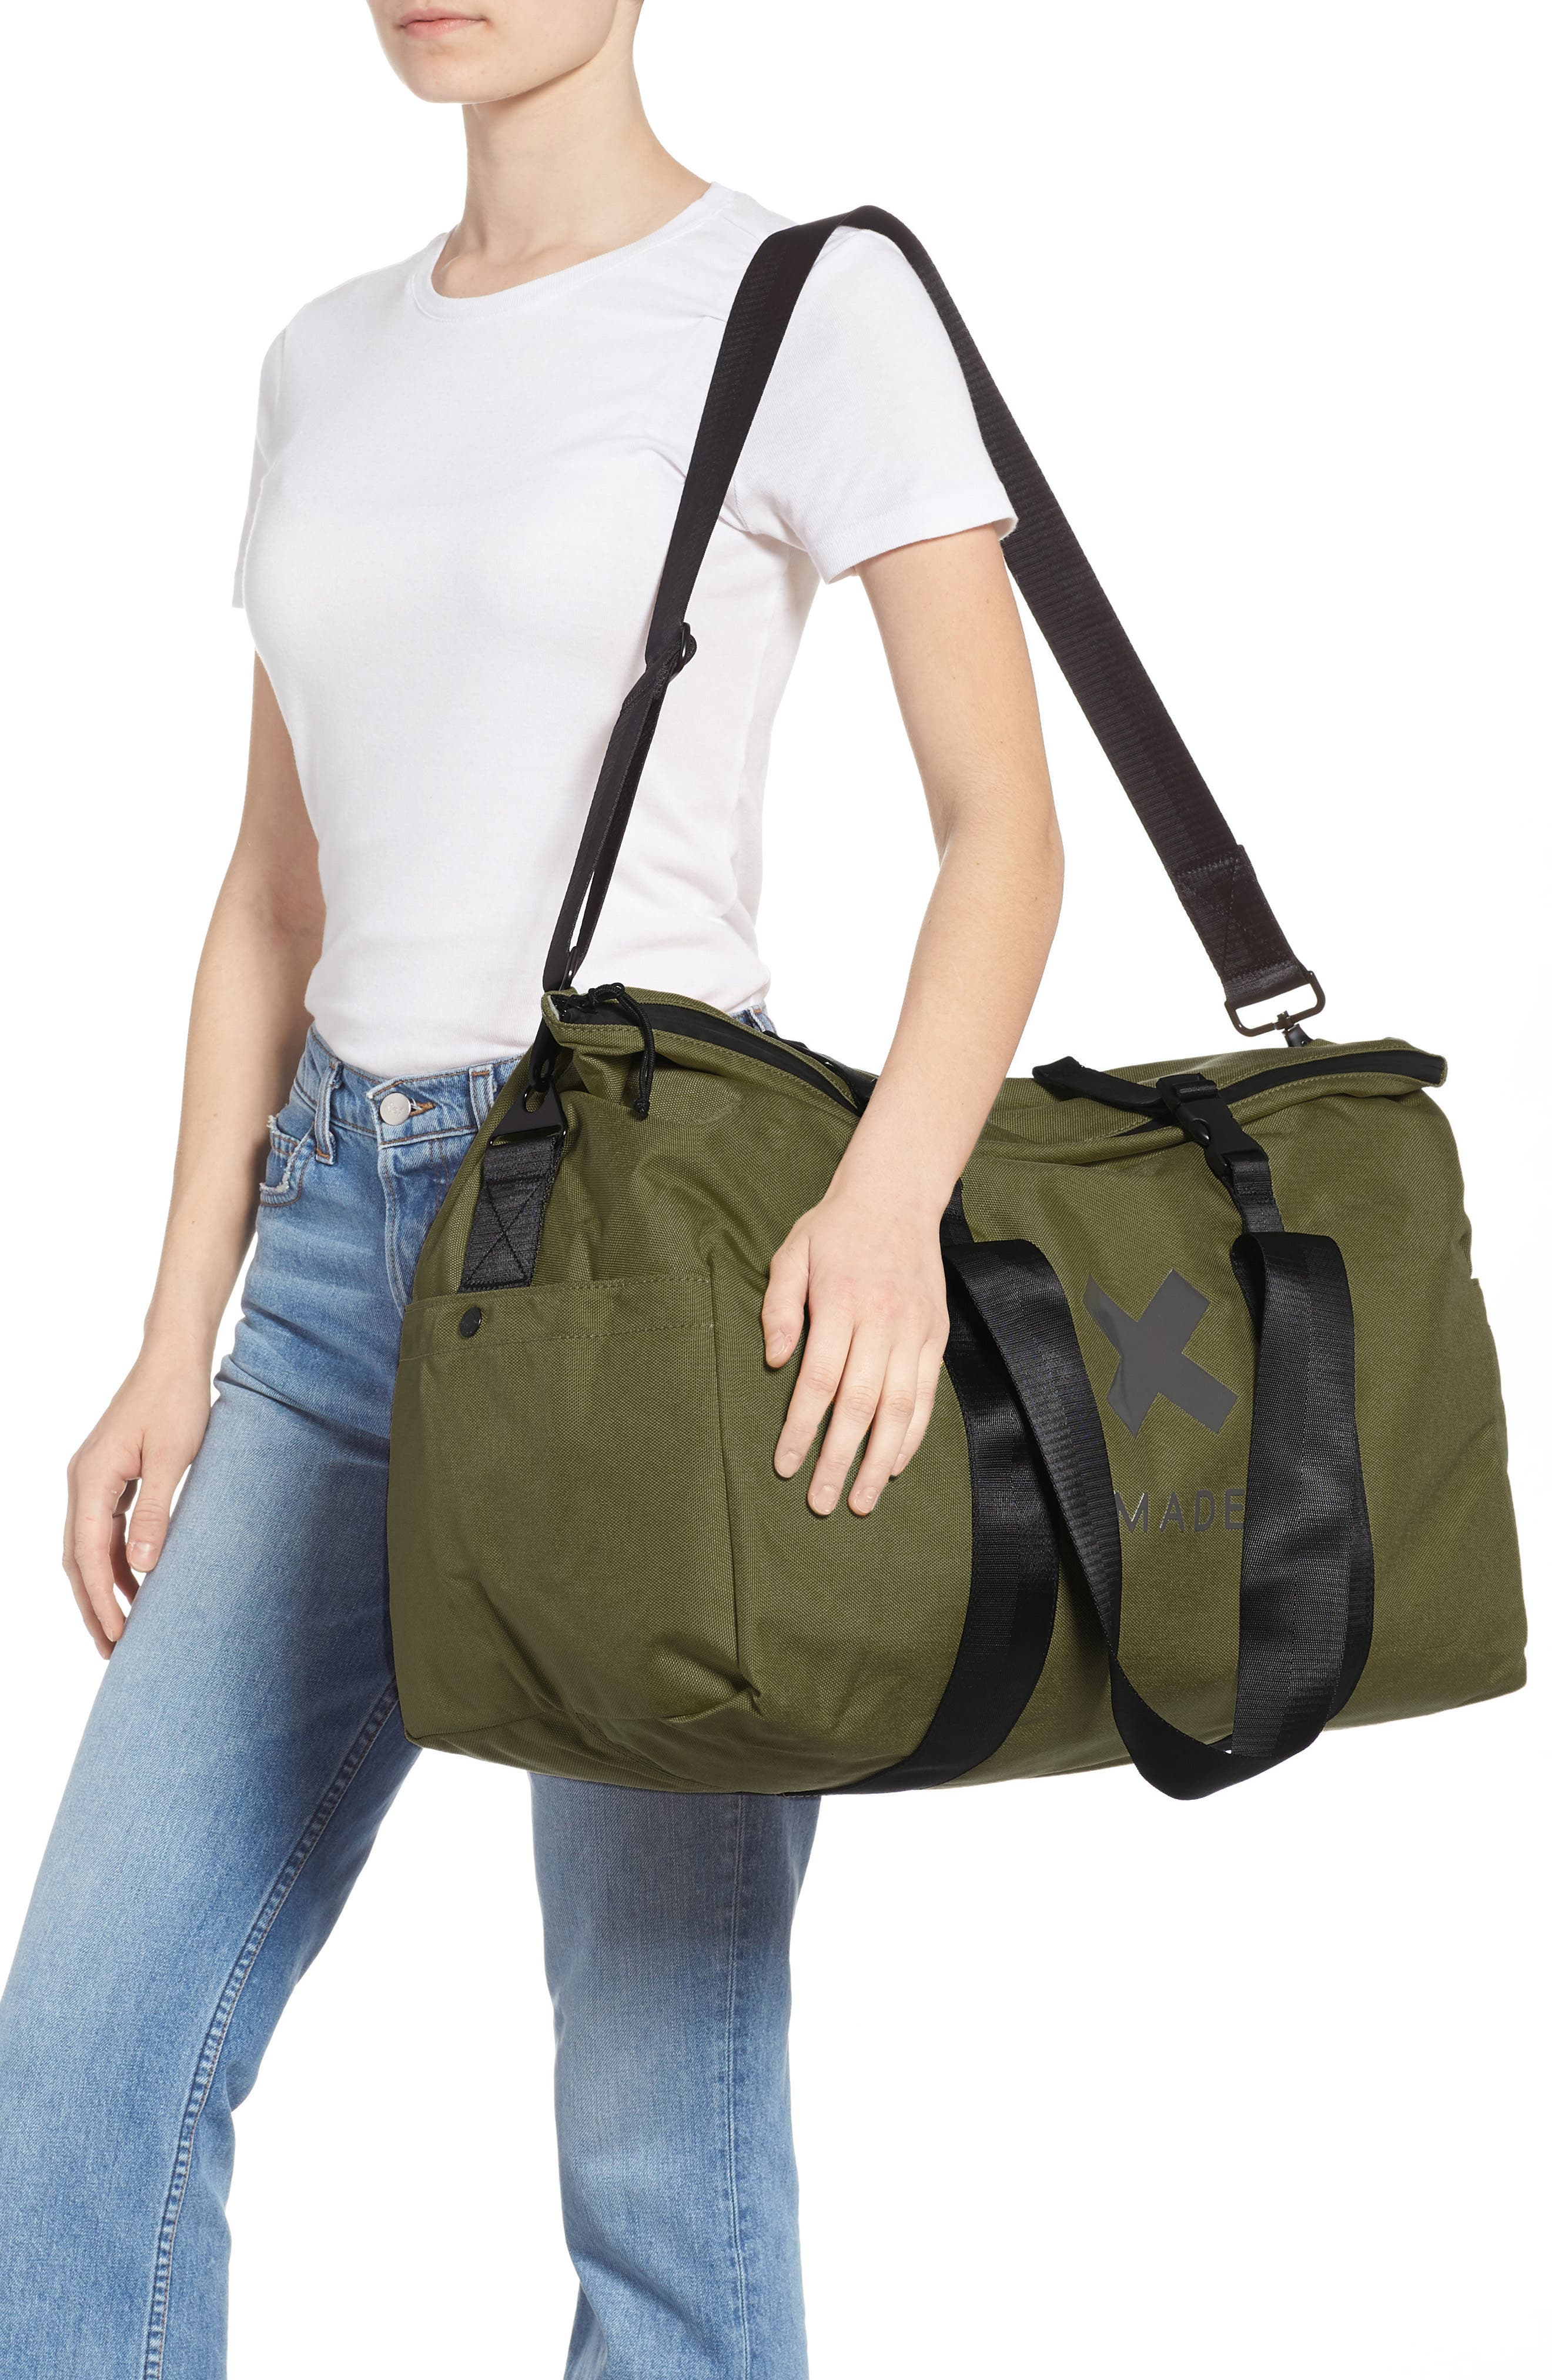 SWS 50L Roll Top Duffel Bag,                             Alternate thumbnail 2, color,                             OLIVE